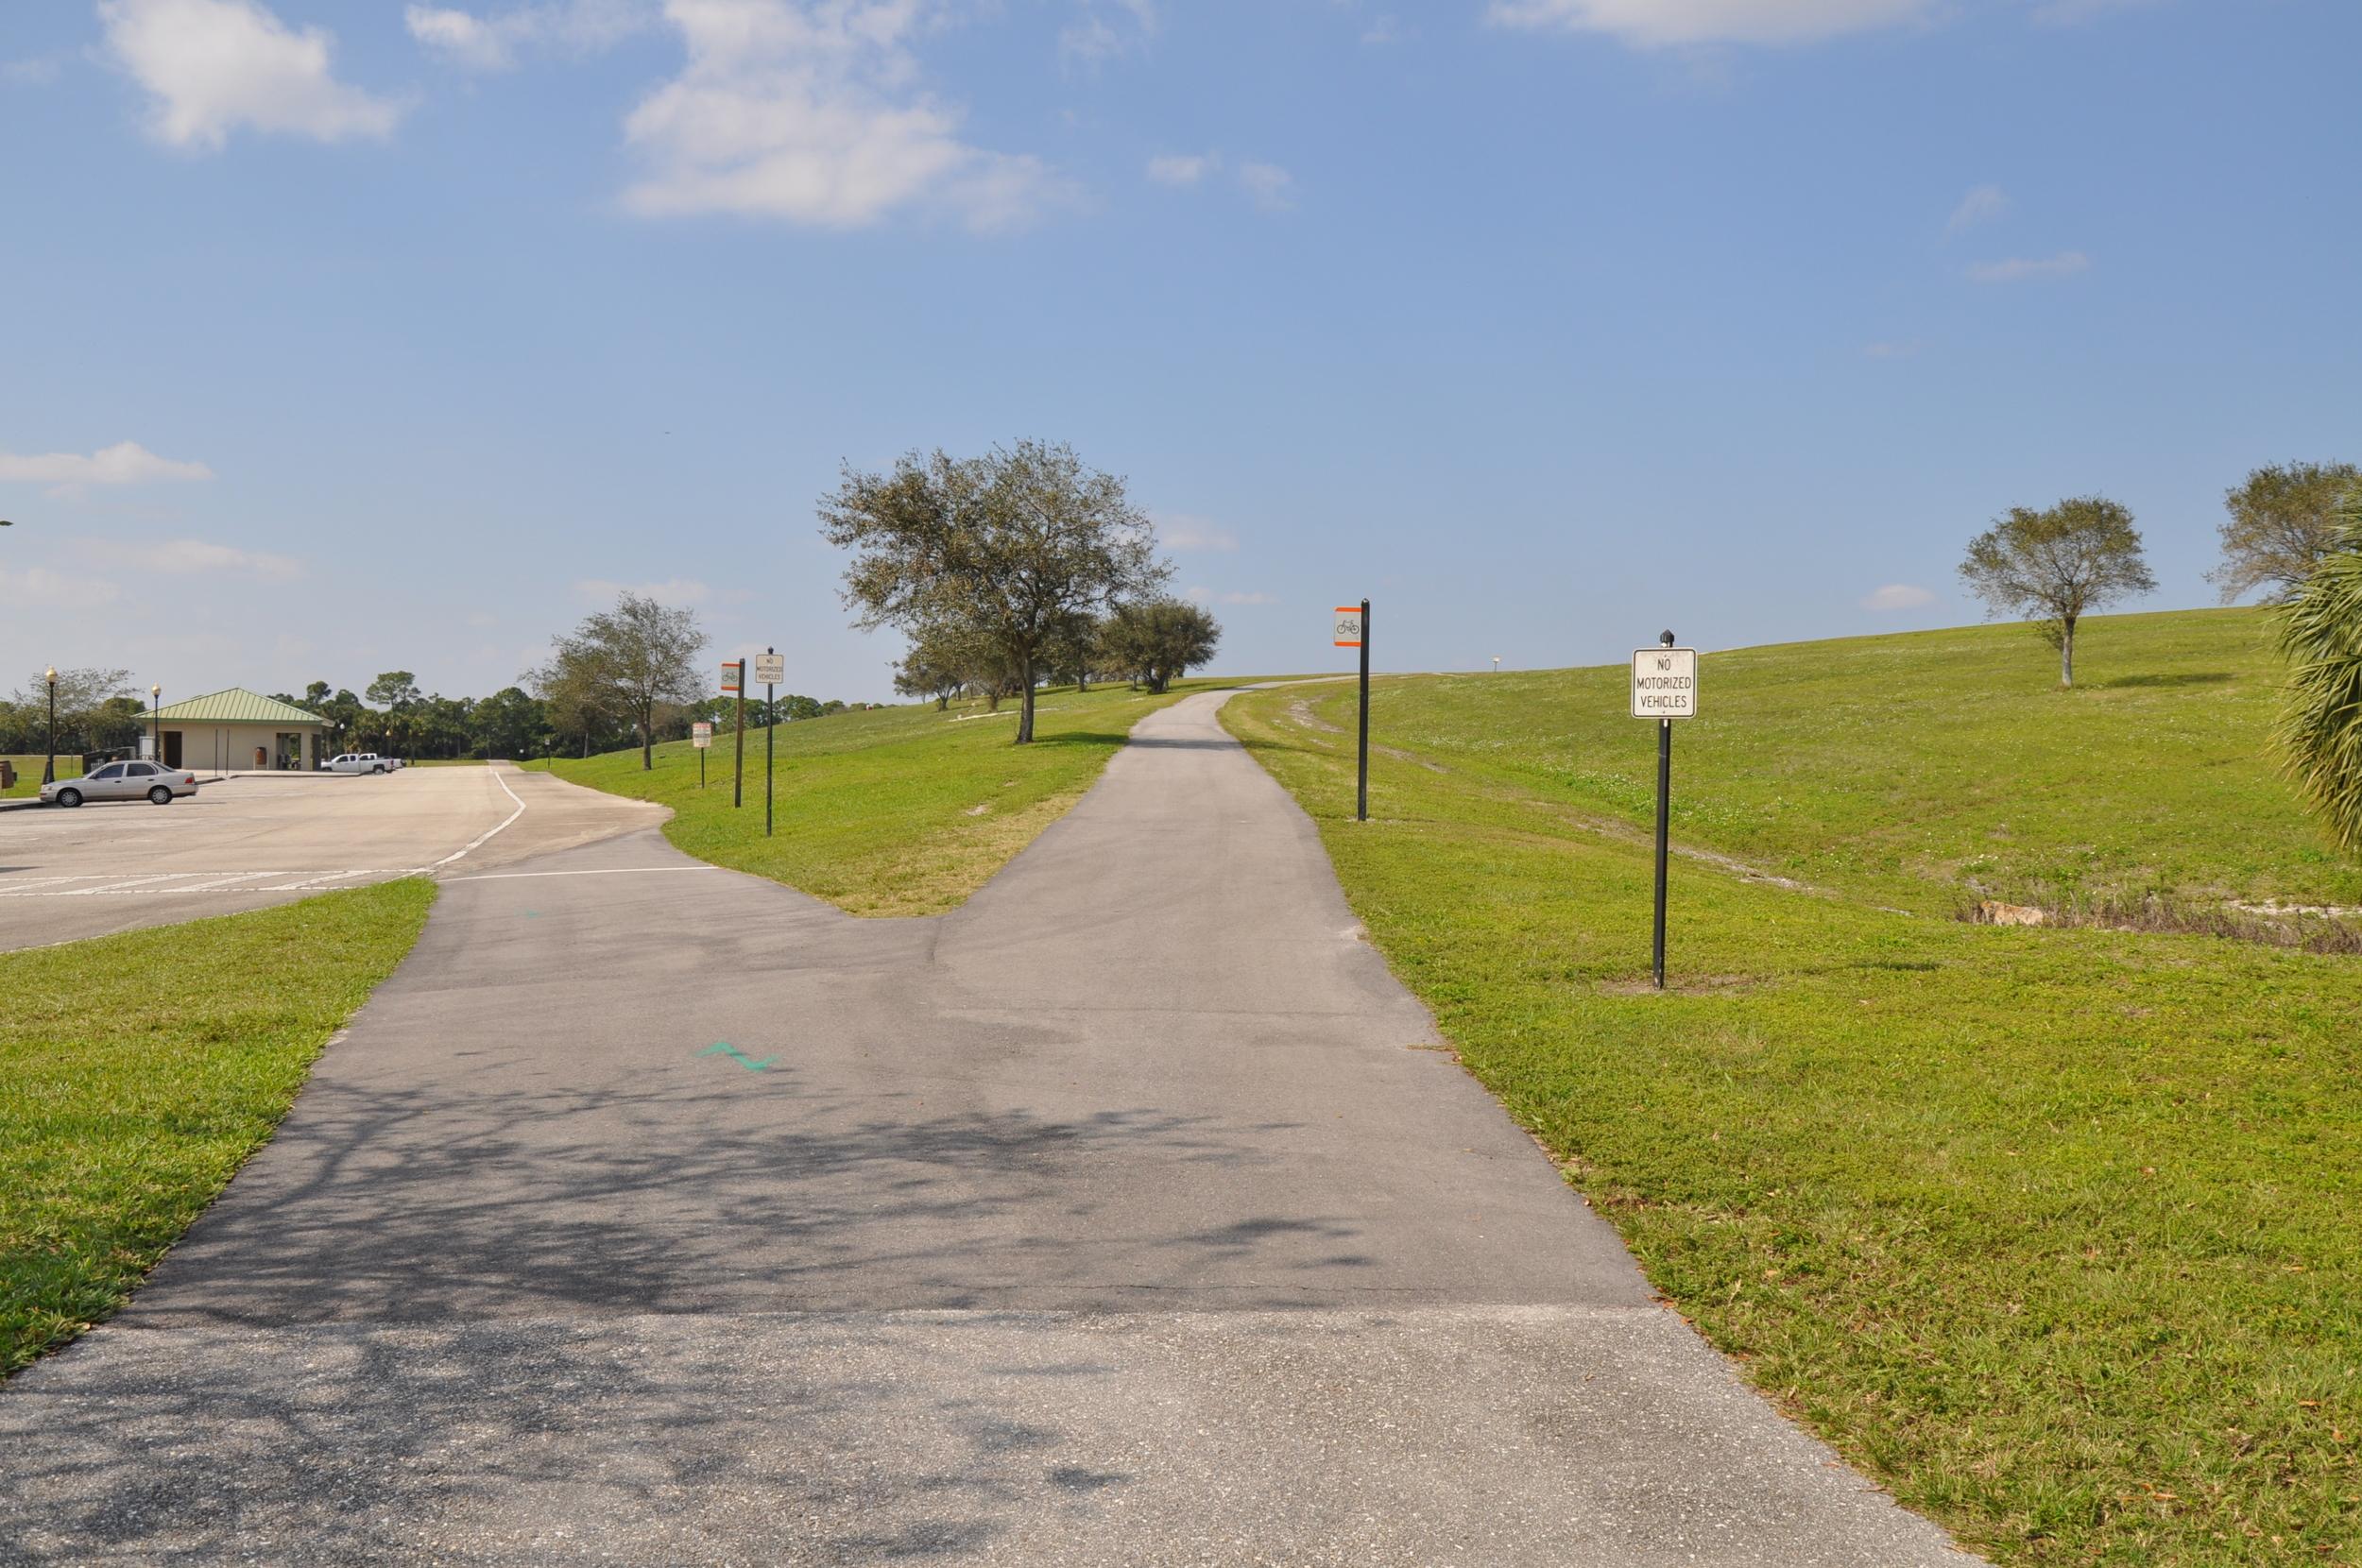 Dyer Landfill Reclamation Palm Beach County Florida Multi Use Trails.JPG